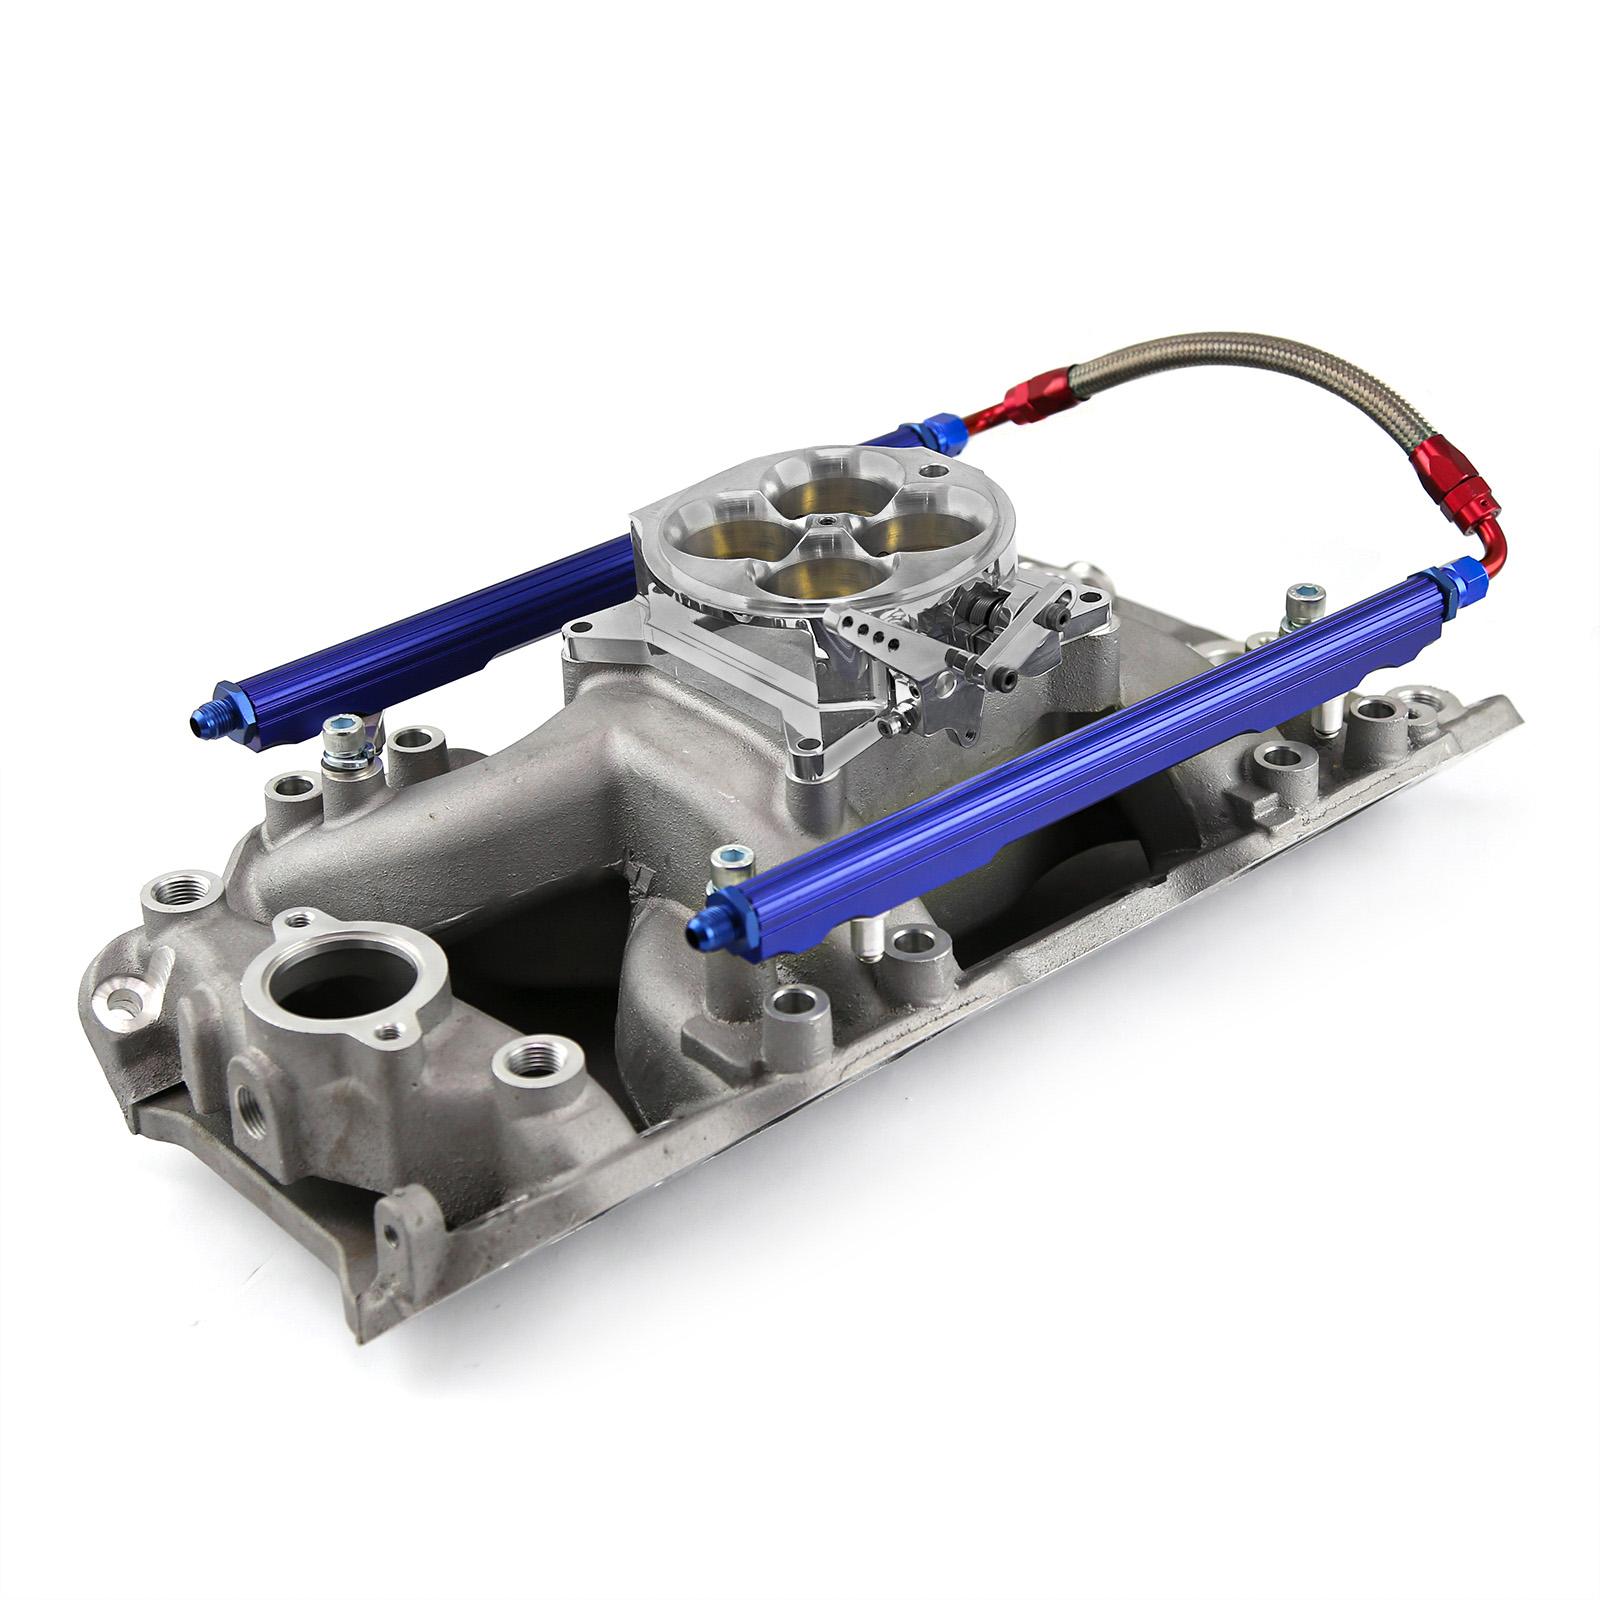 PCE® PCE148.1068 Chevy BBC 454 Rect Port Eliminator Intake Manifold, Fuel Rails & Throttle Body